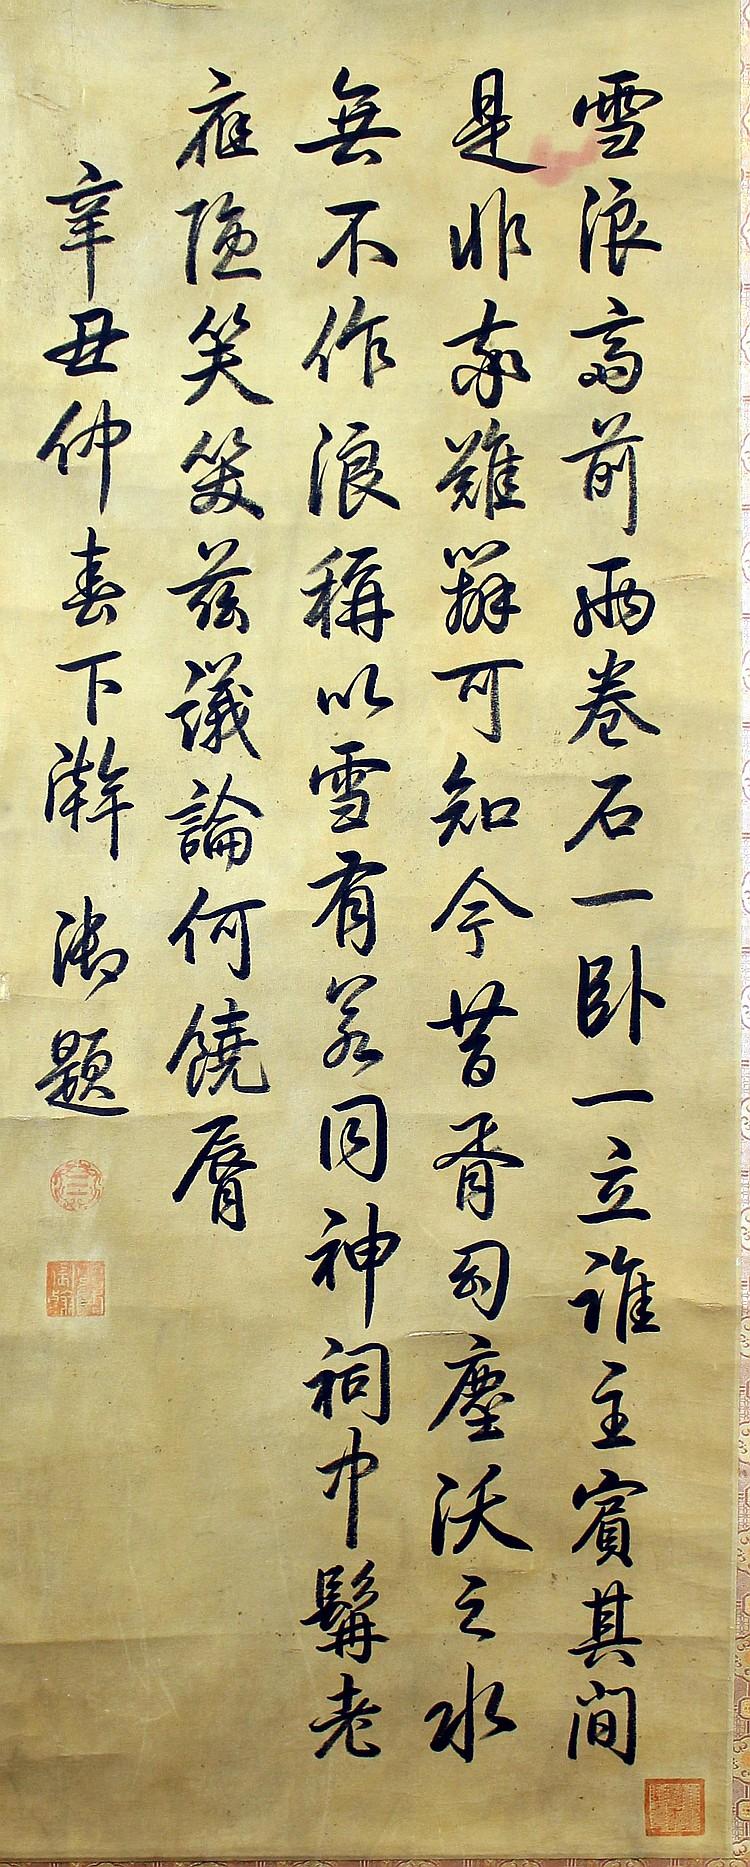 Qian Long Chinese Calligraphy